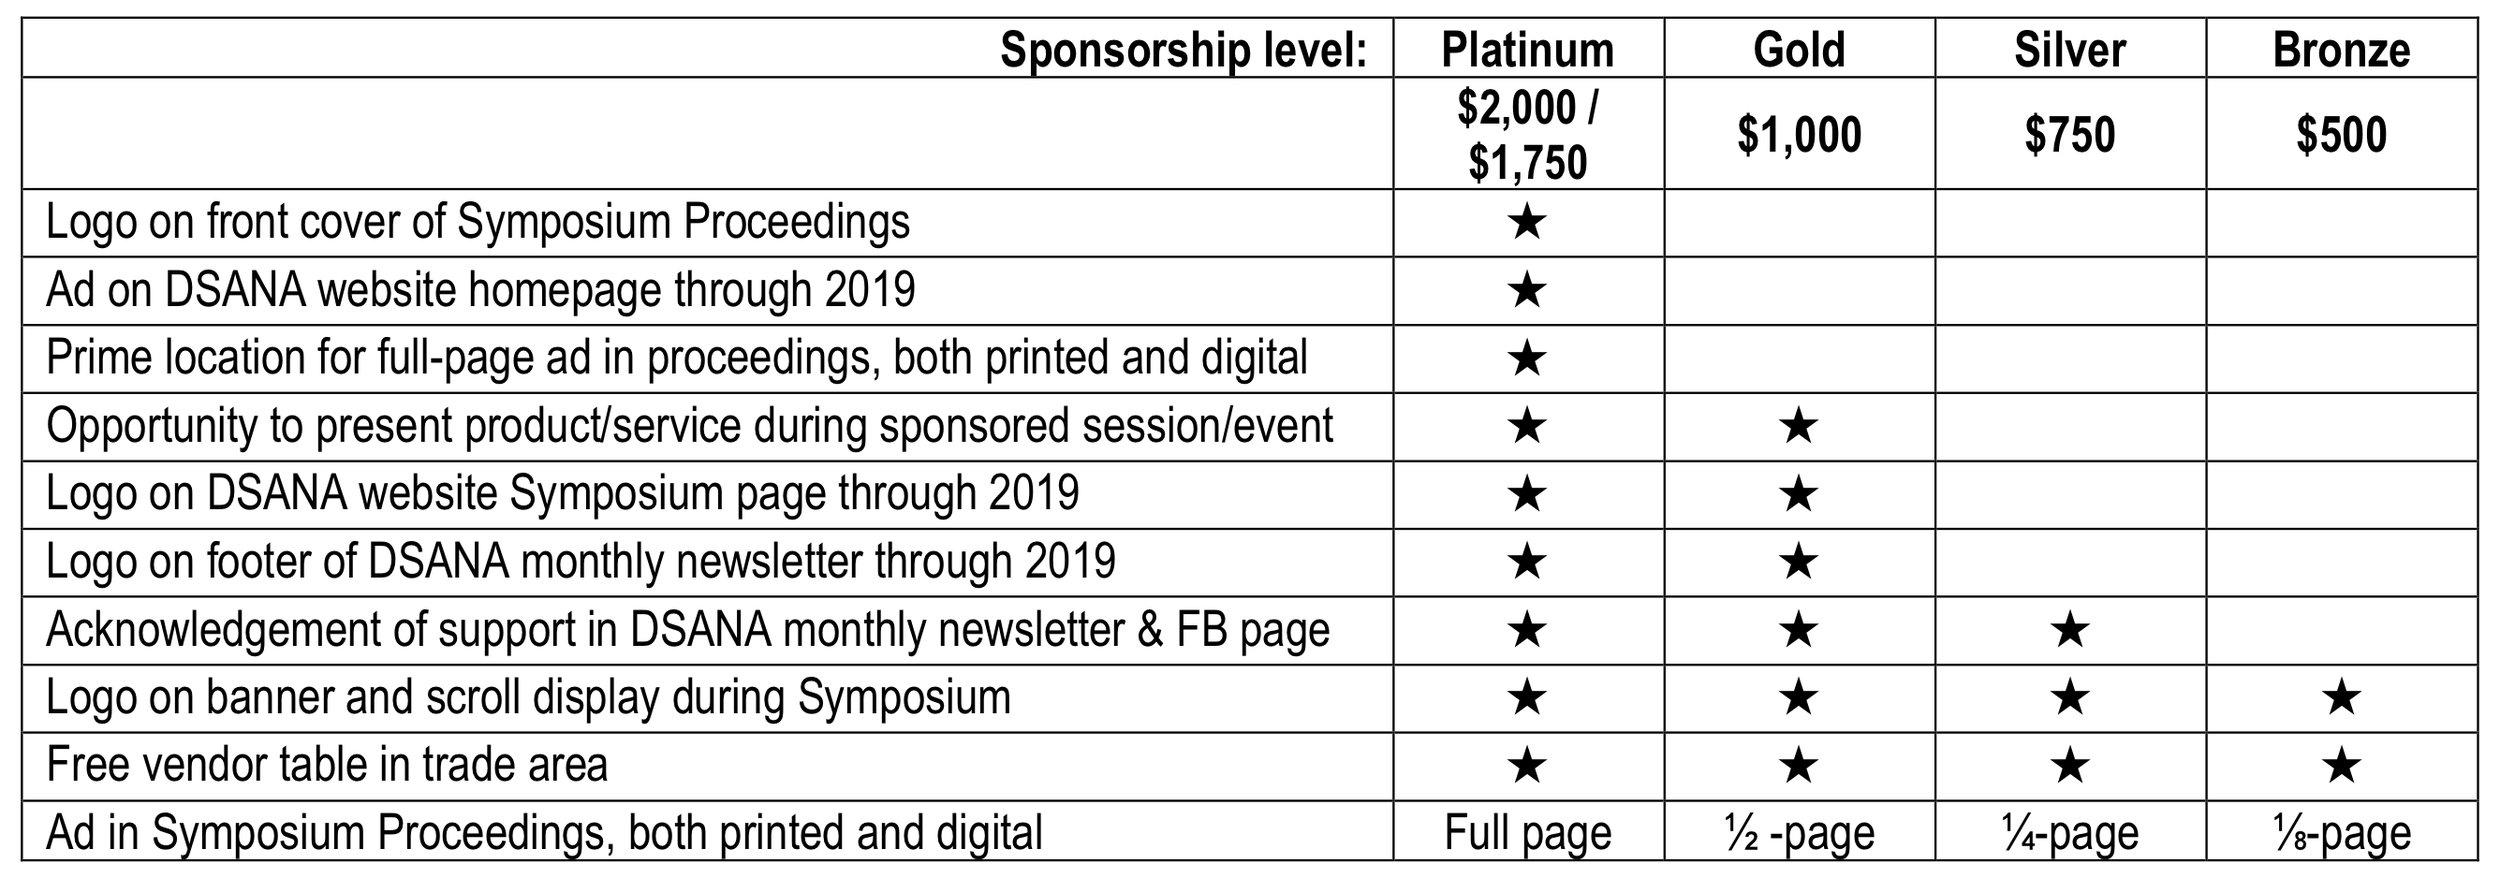 DSANA 2019 Symposium Sponsorship info.jpg